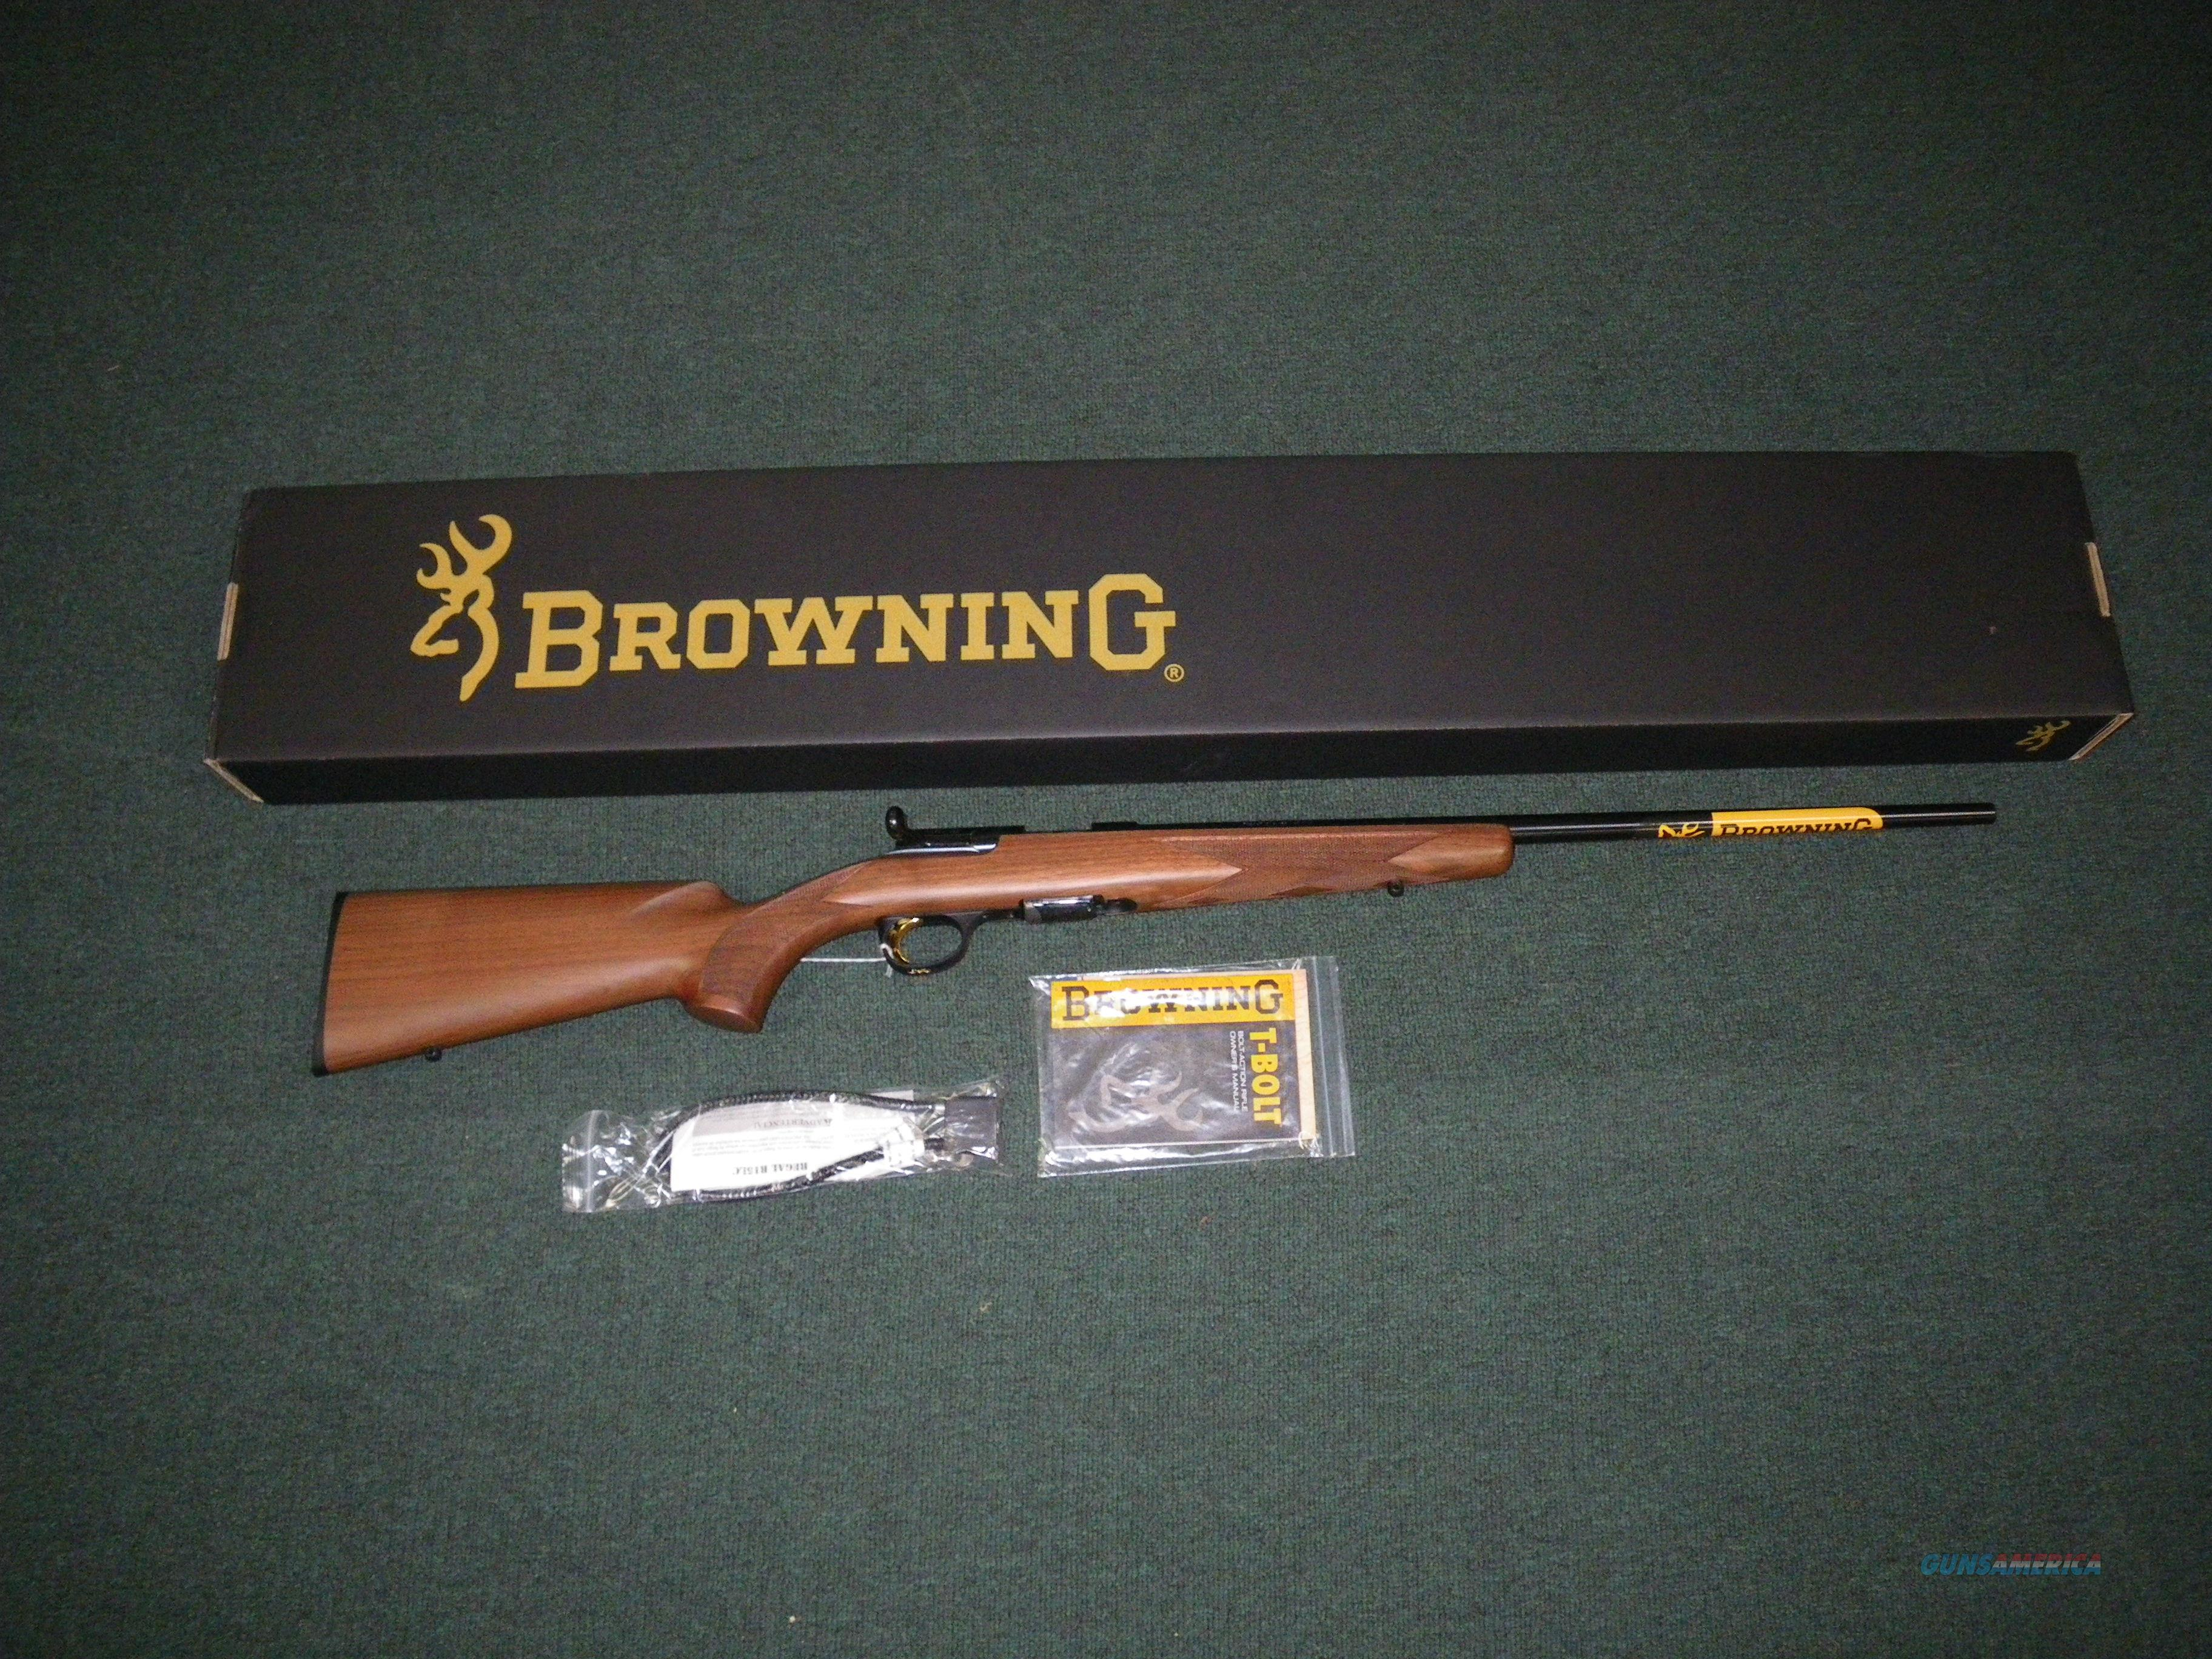 "Browning T-Bolt Sporter Wood 22 Mag 22"" #025175204  Guns > Rifles > Browning Rifles > Bolt Action > Hunting > Blue"